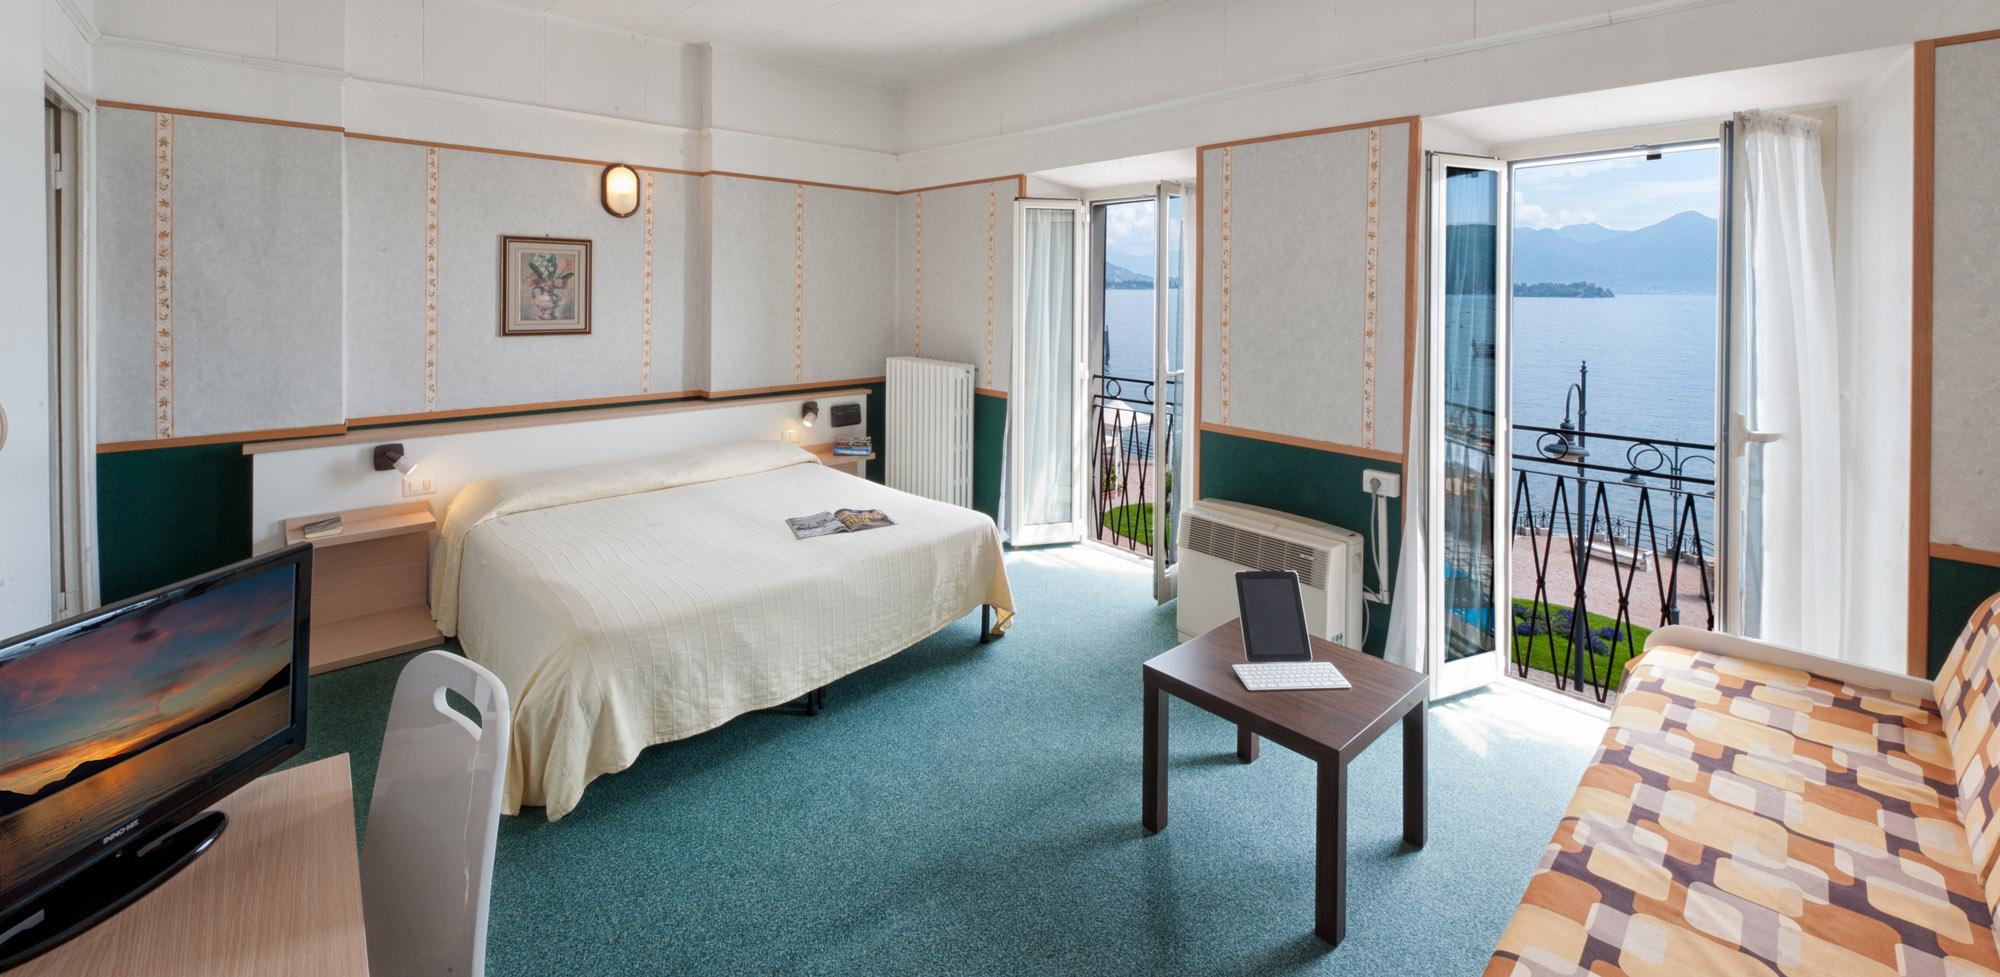 hotel verbania lac majeur